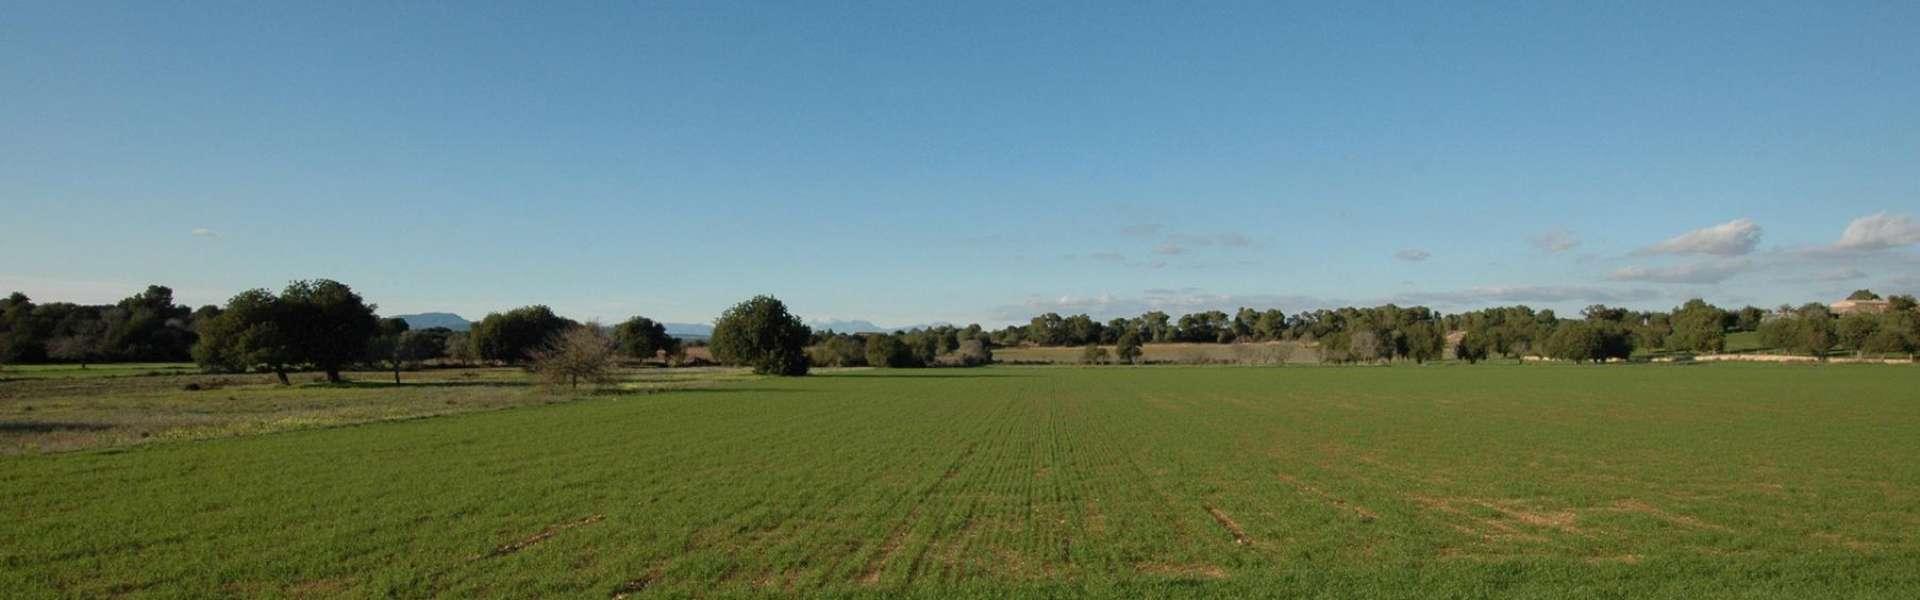 24.000 qm großes Finca-Baugrundstück in Cas Concos